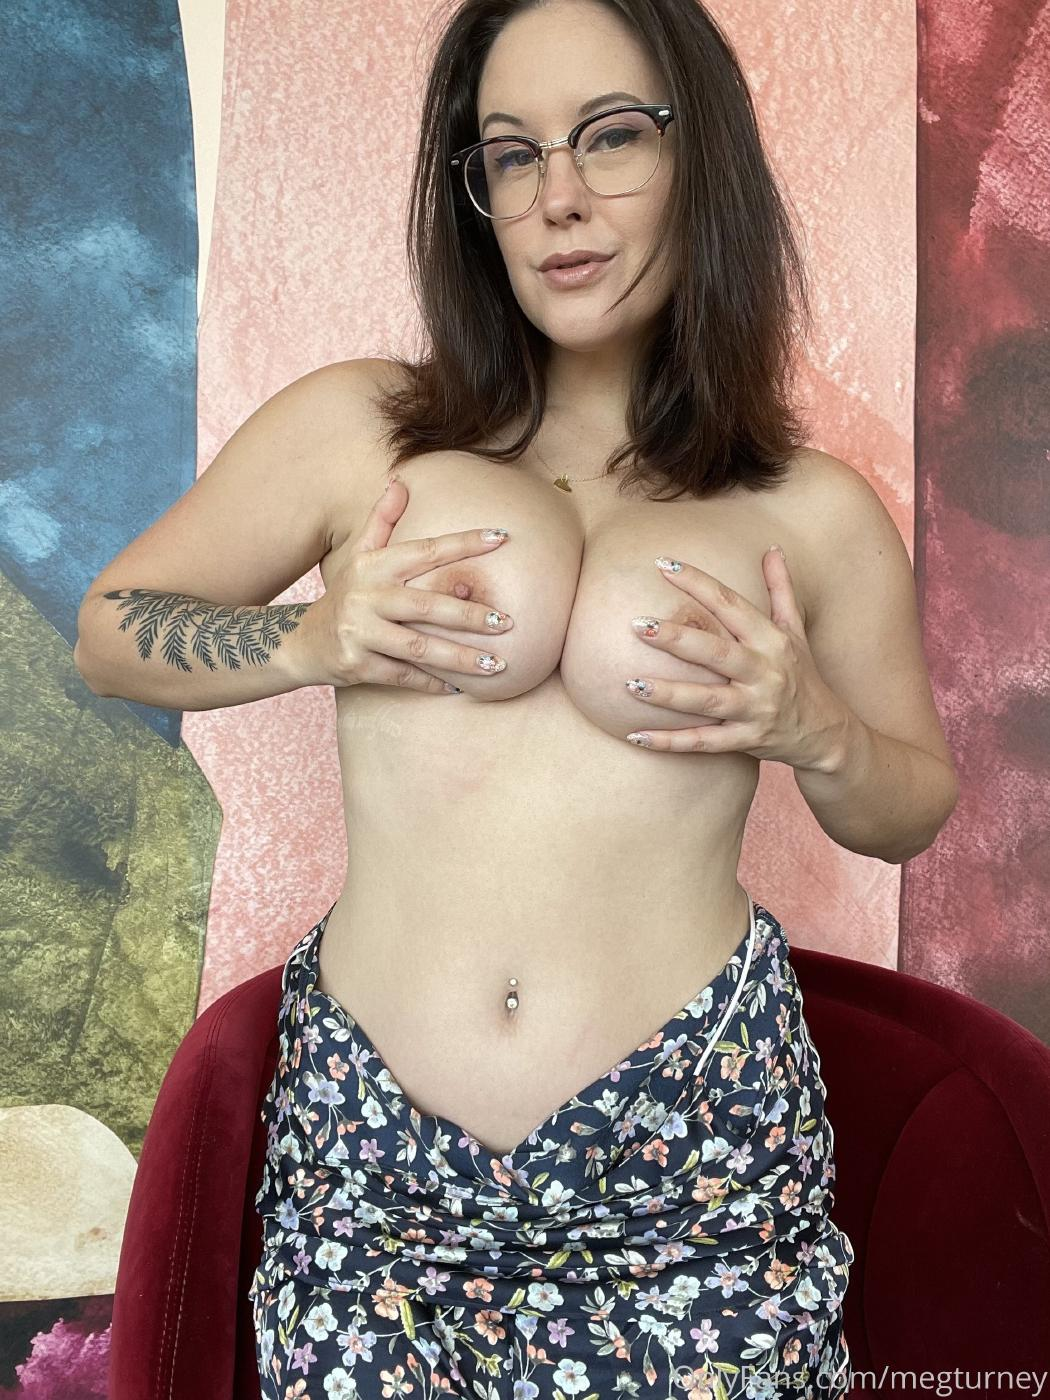 Meg Turney Unshaven Pussy Candids Onlyfans Set Leaked Bglzvv